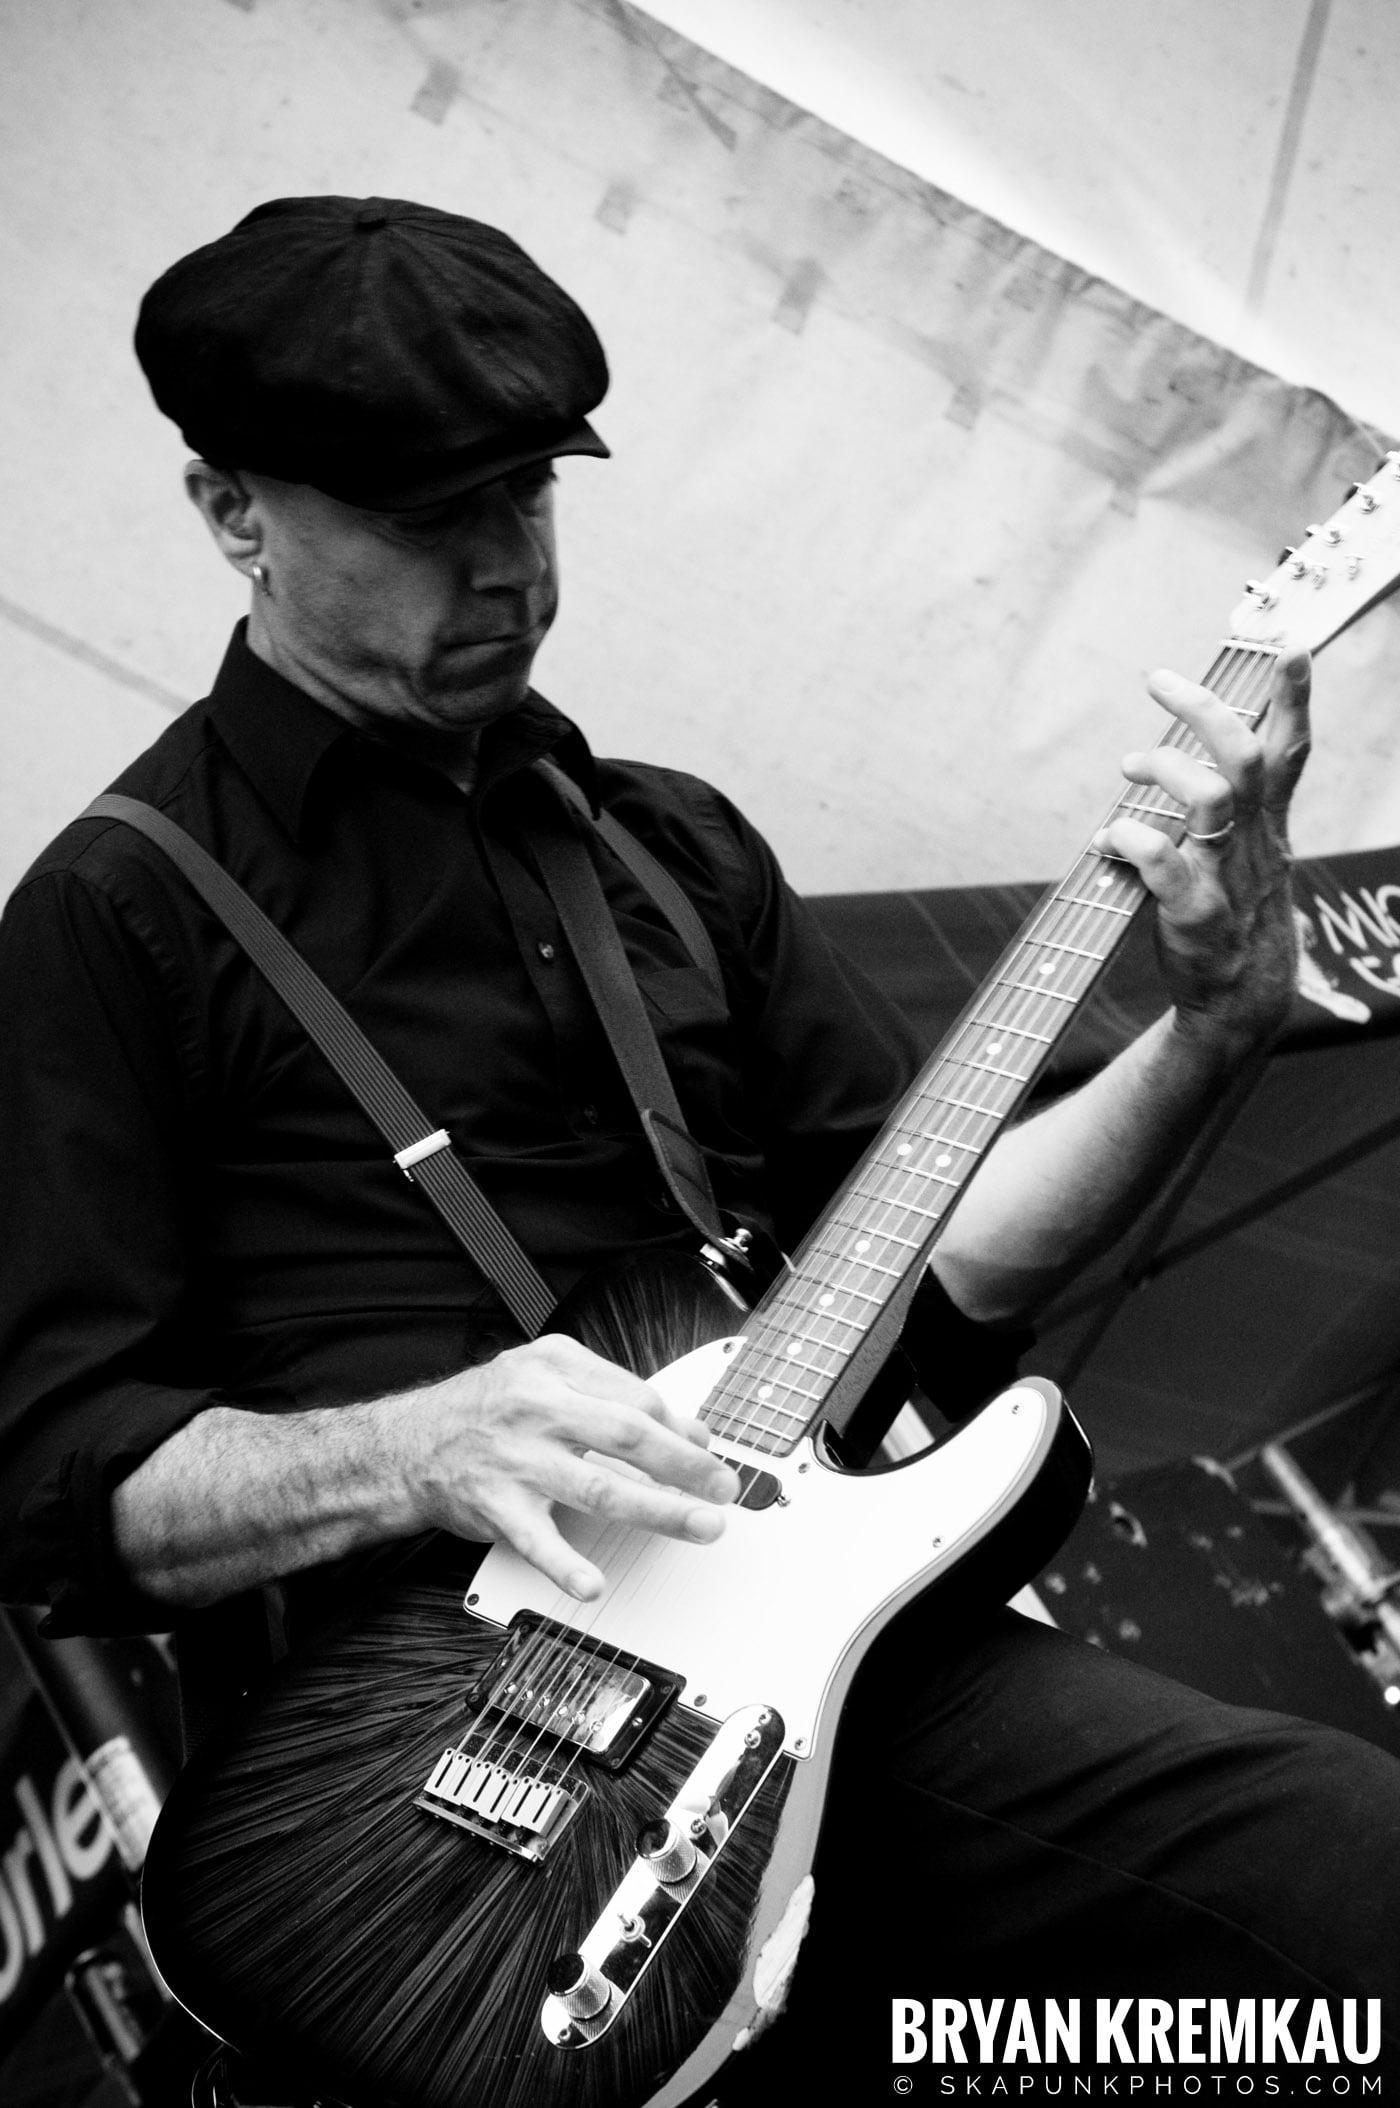 Flogging Molly @ Warped Tour 2009, Scranton PA - 07.15.09 (14)